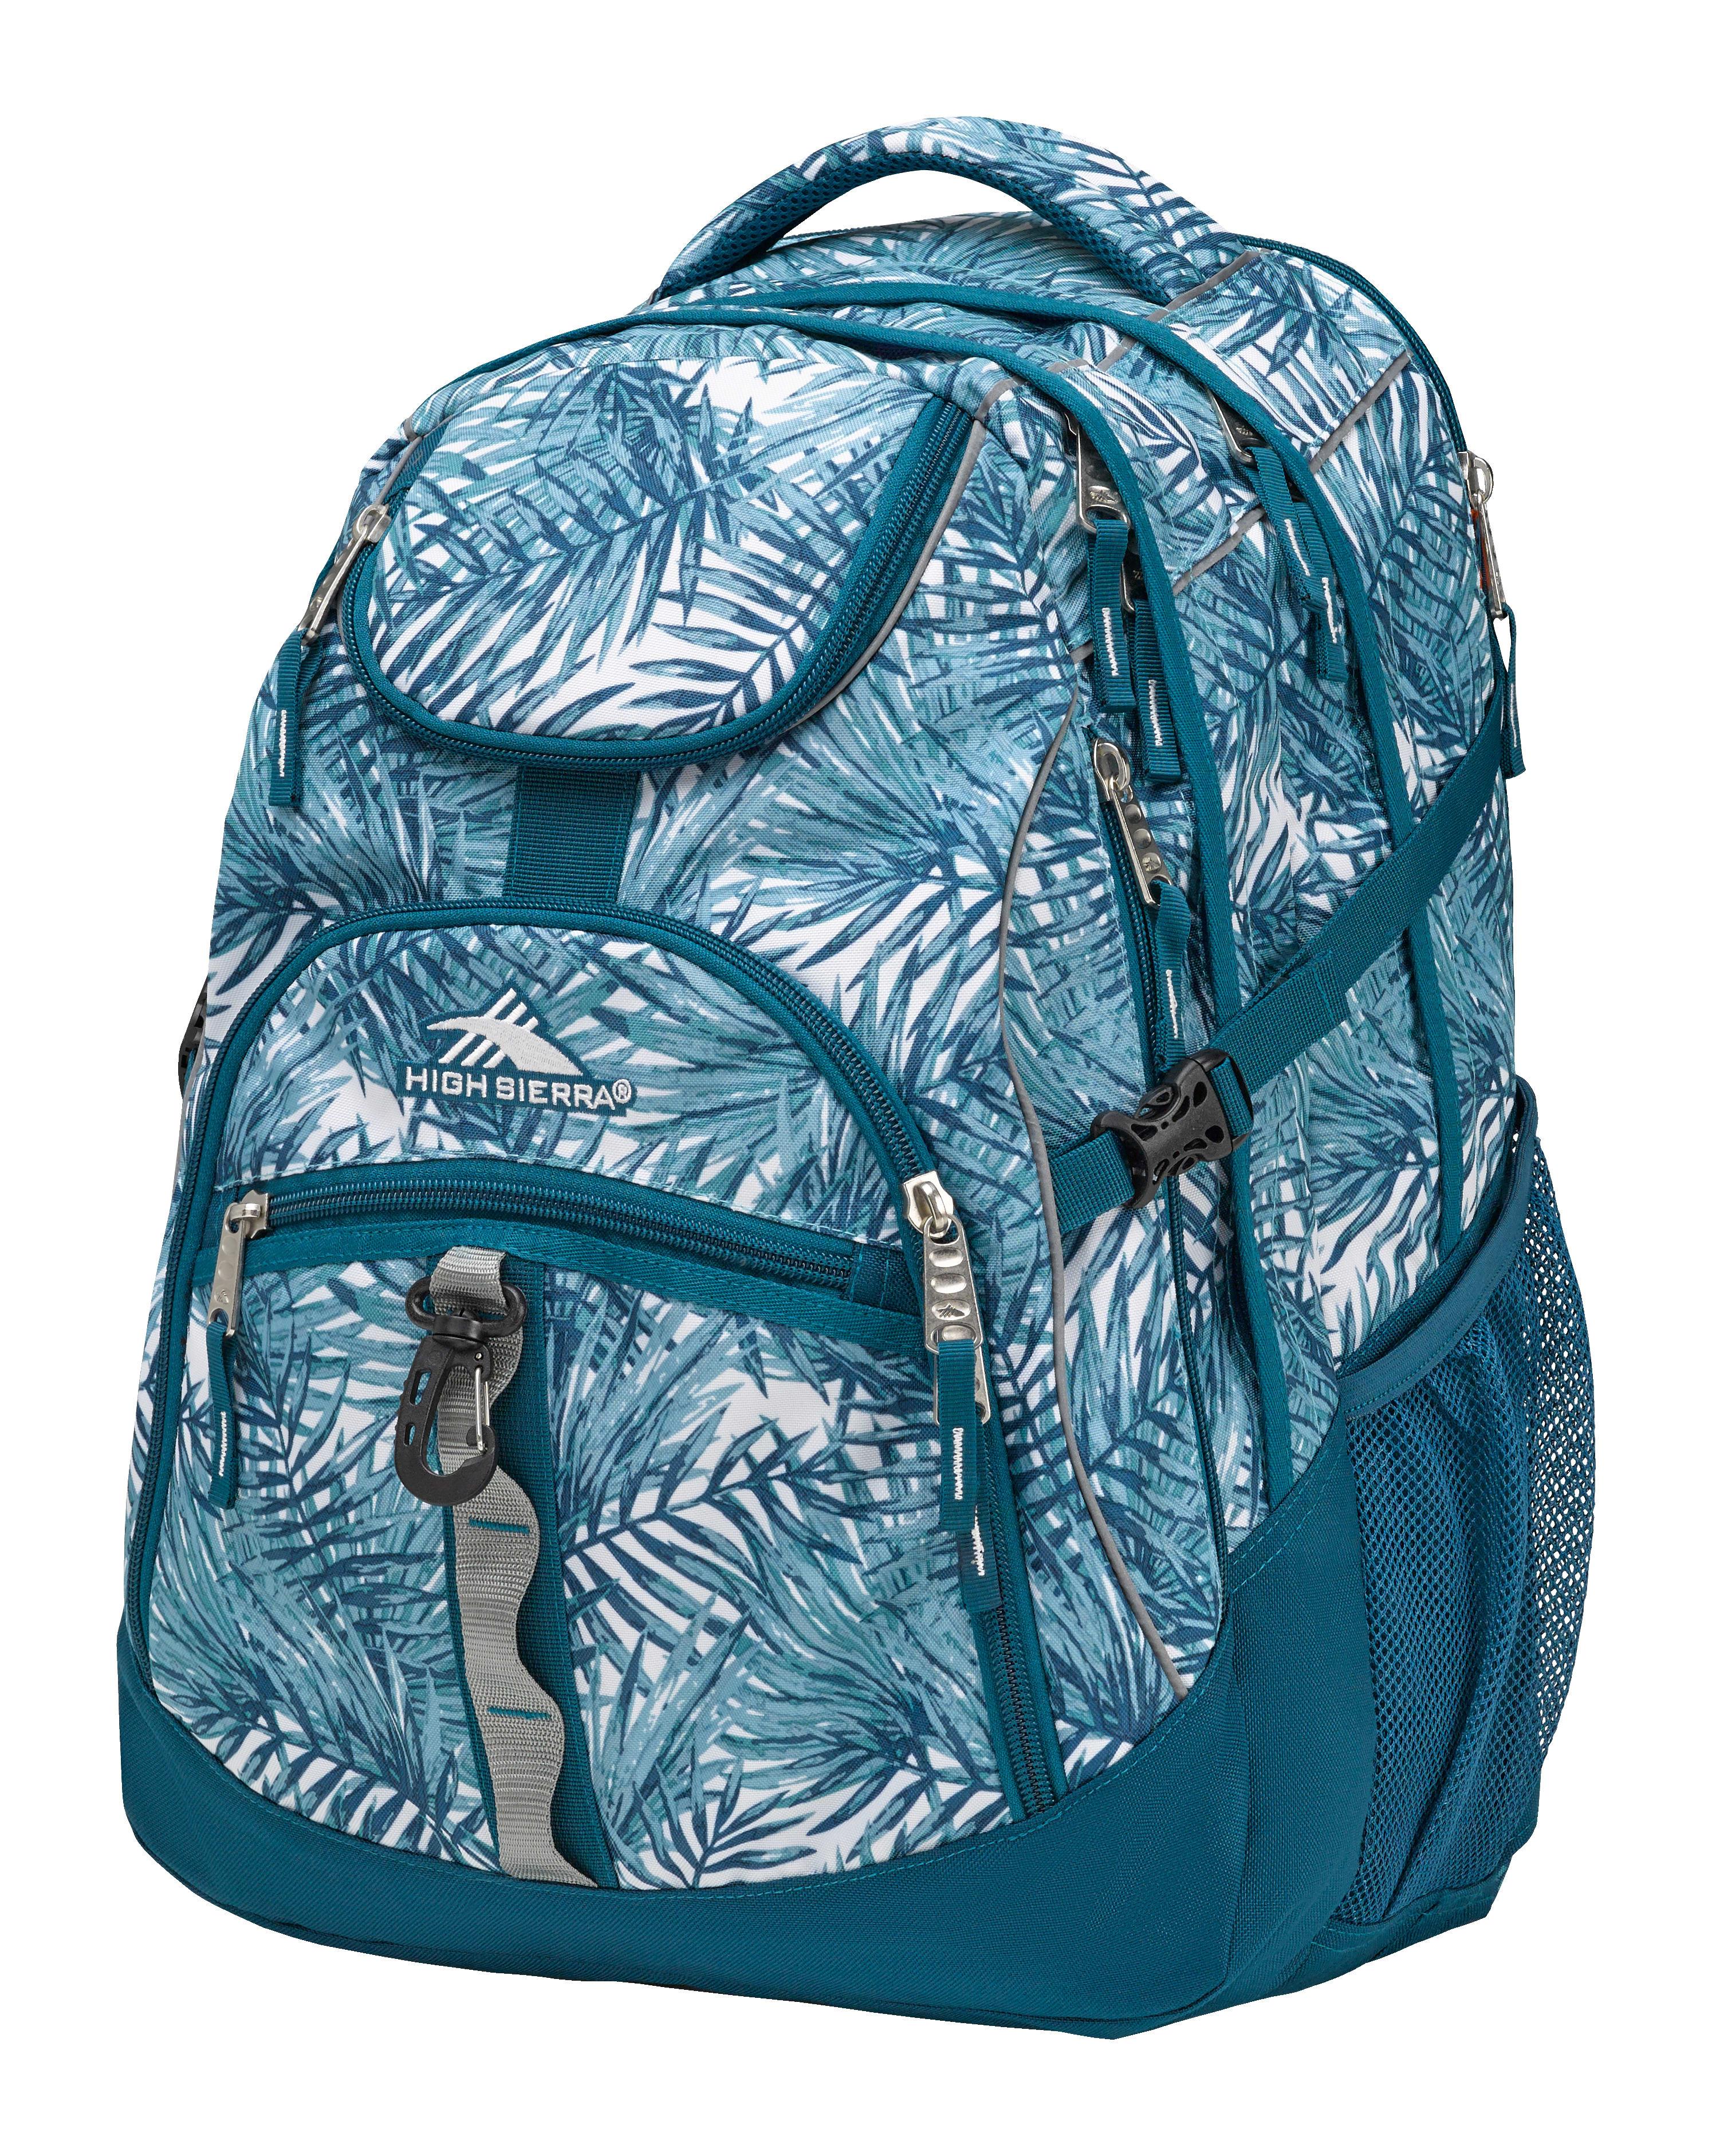 High Sierra® Access Laptop Backpack, Lagoon/Palms